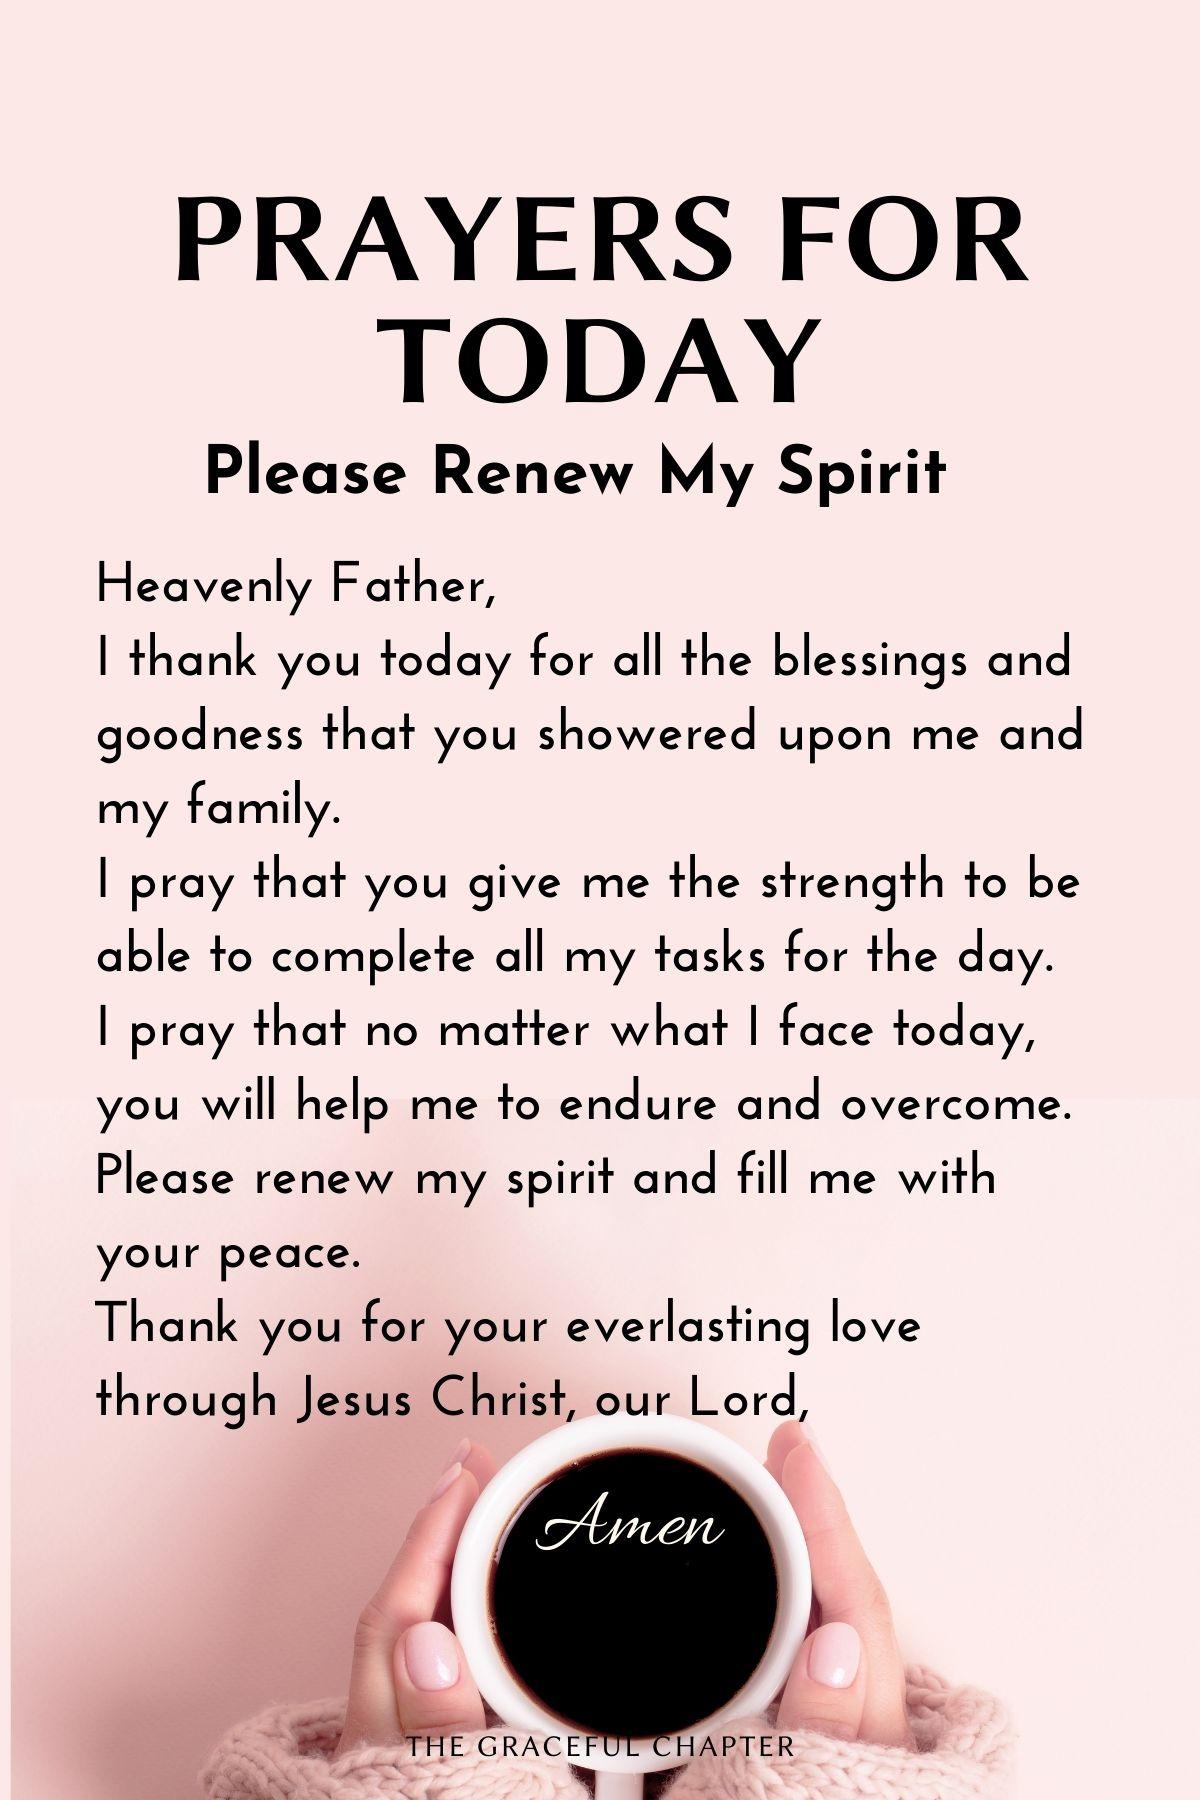 Prayers for today - Please renew my spirit